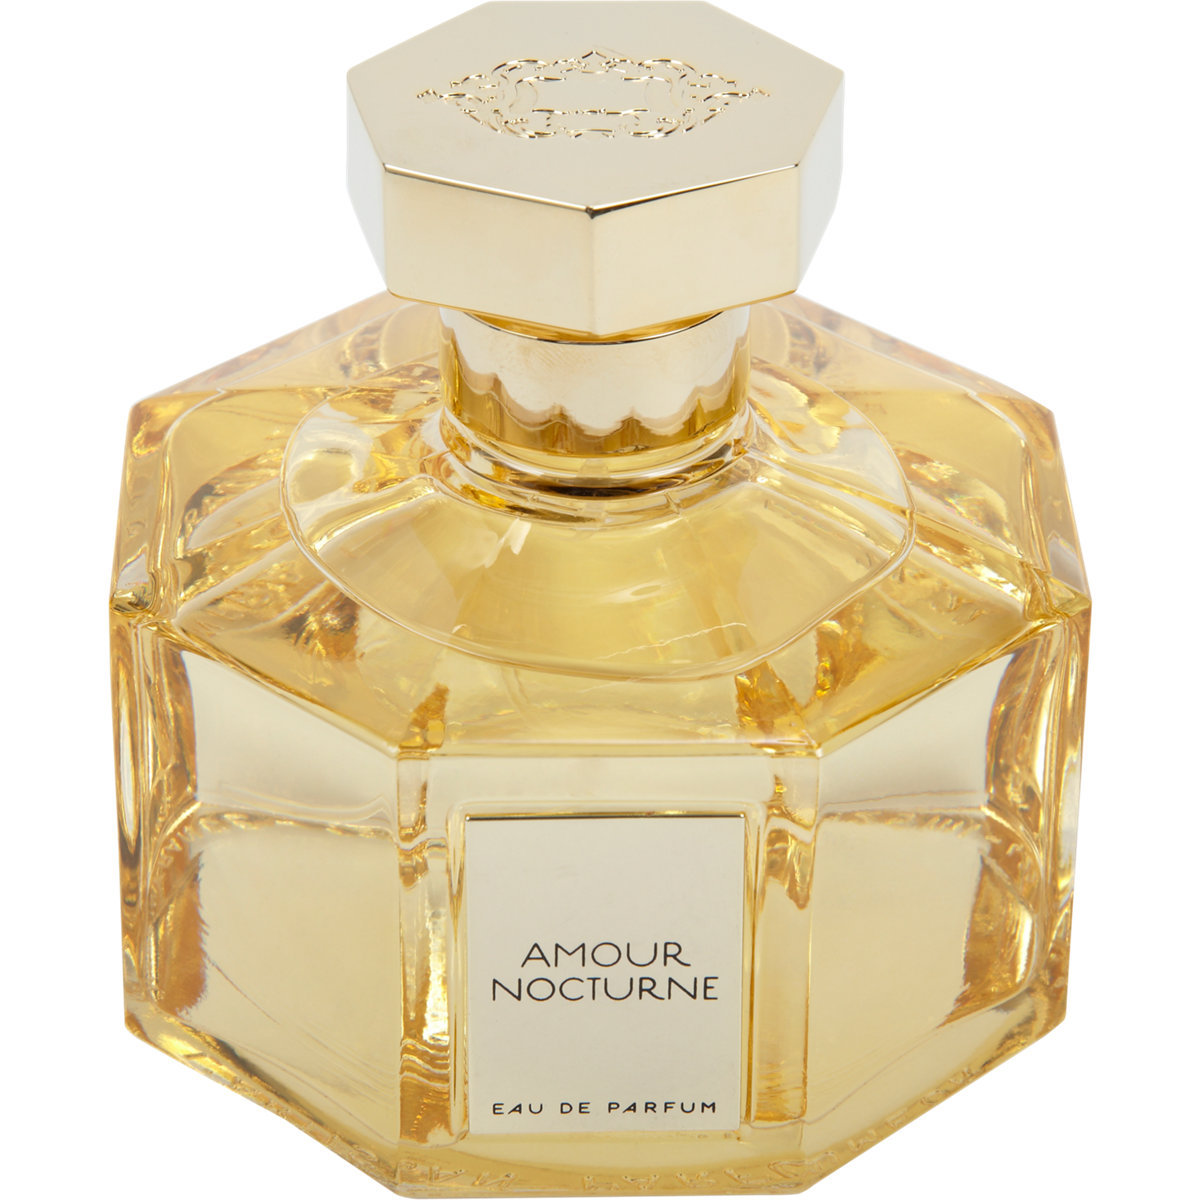 AMOUR NOCTURNE by L'artisan 5ml Travel Spray Milk Orchid Gun Powder Perfume